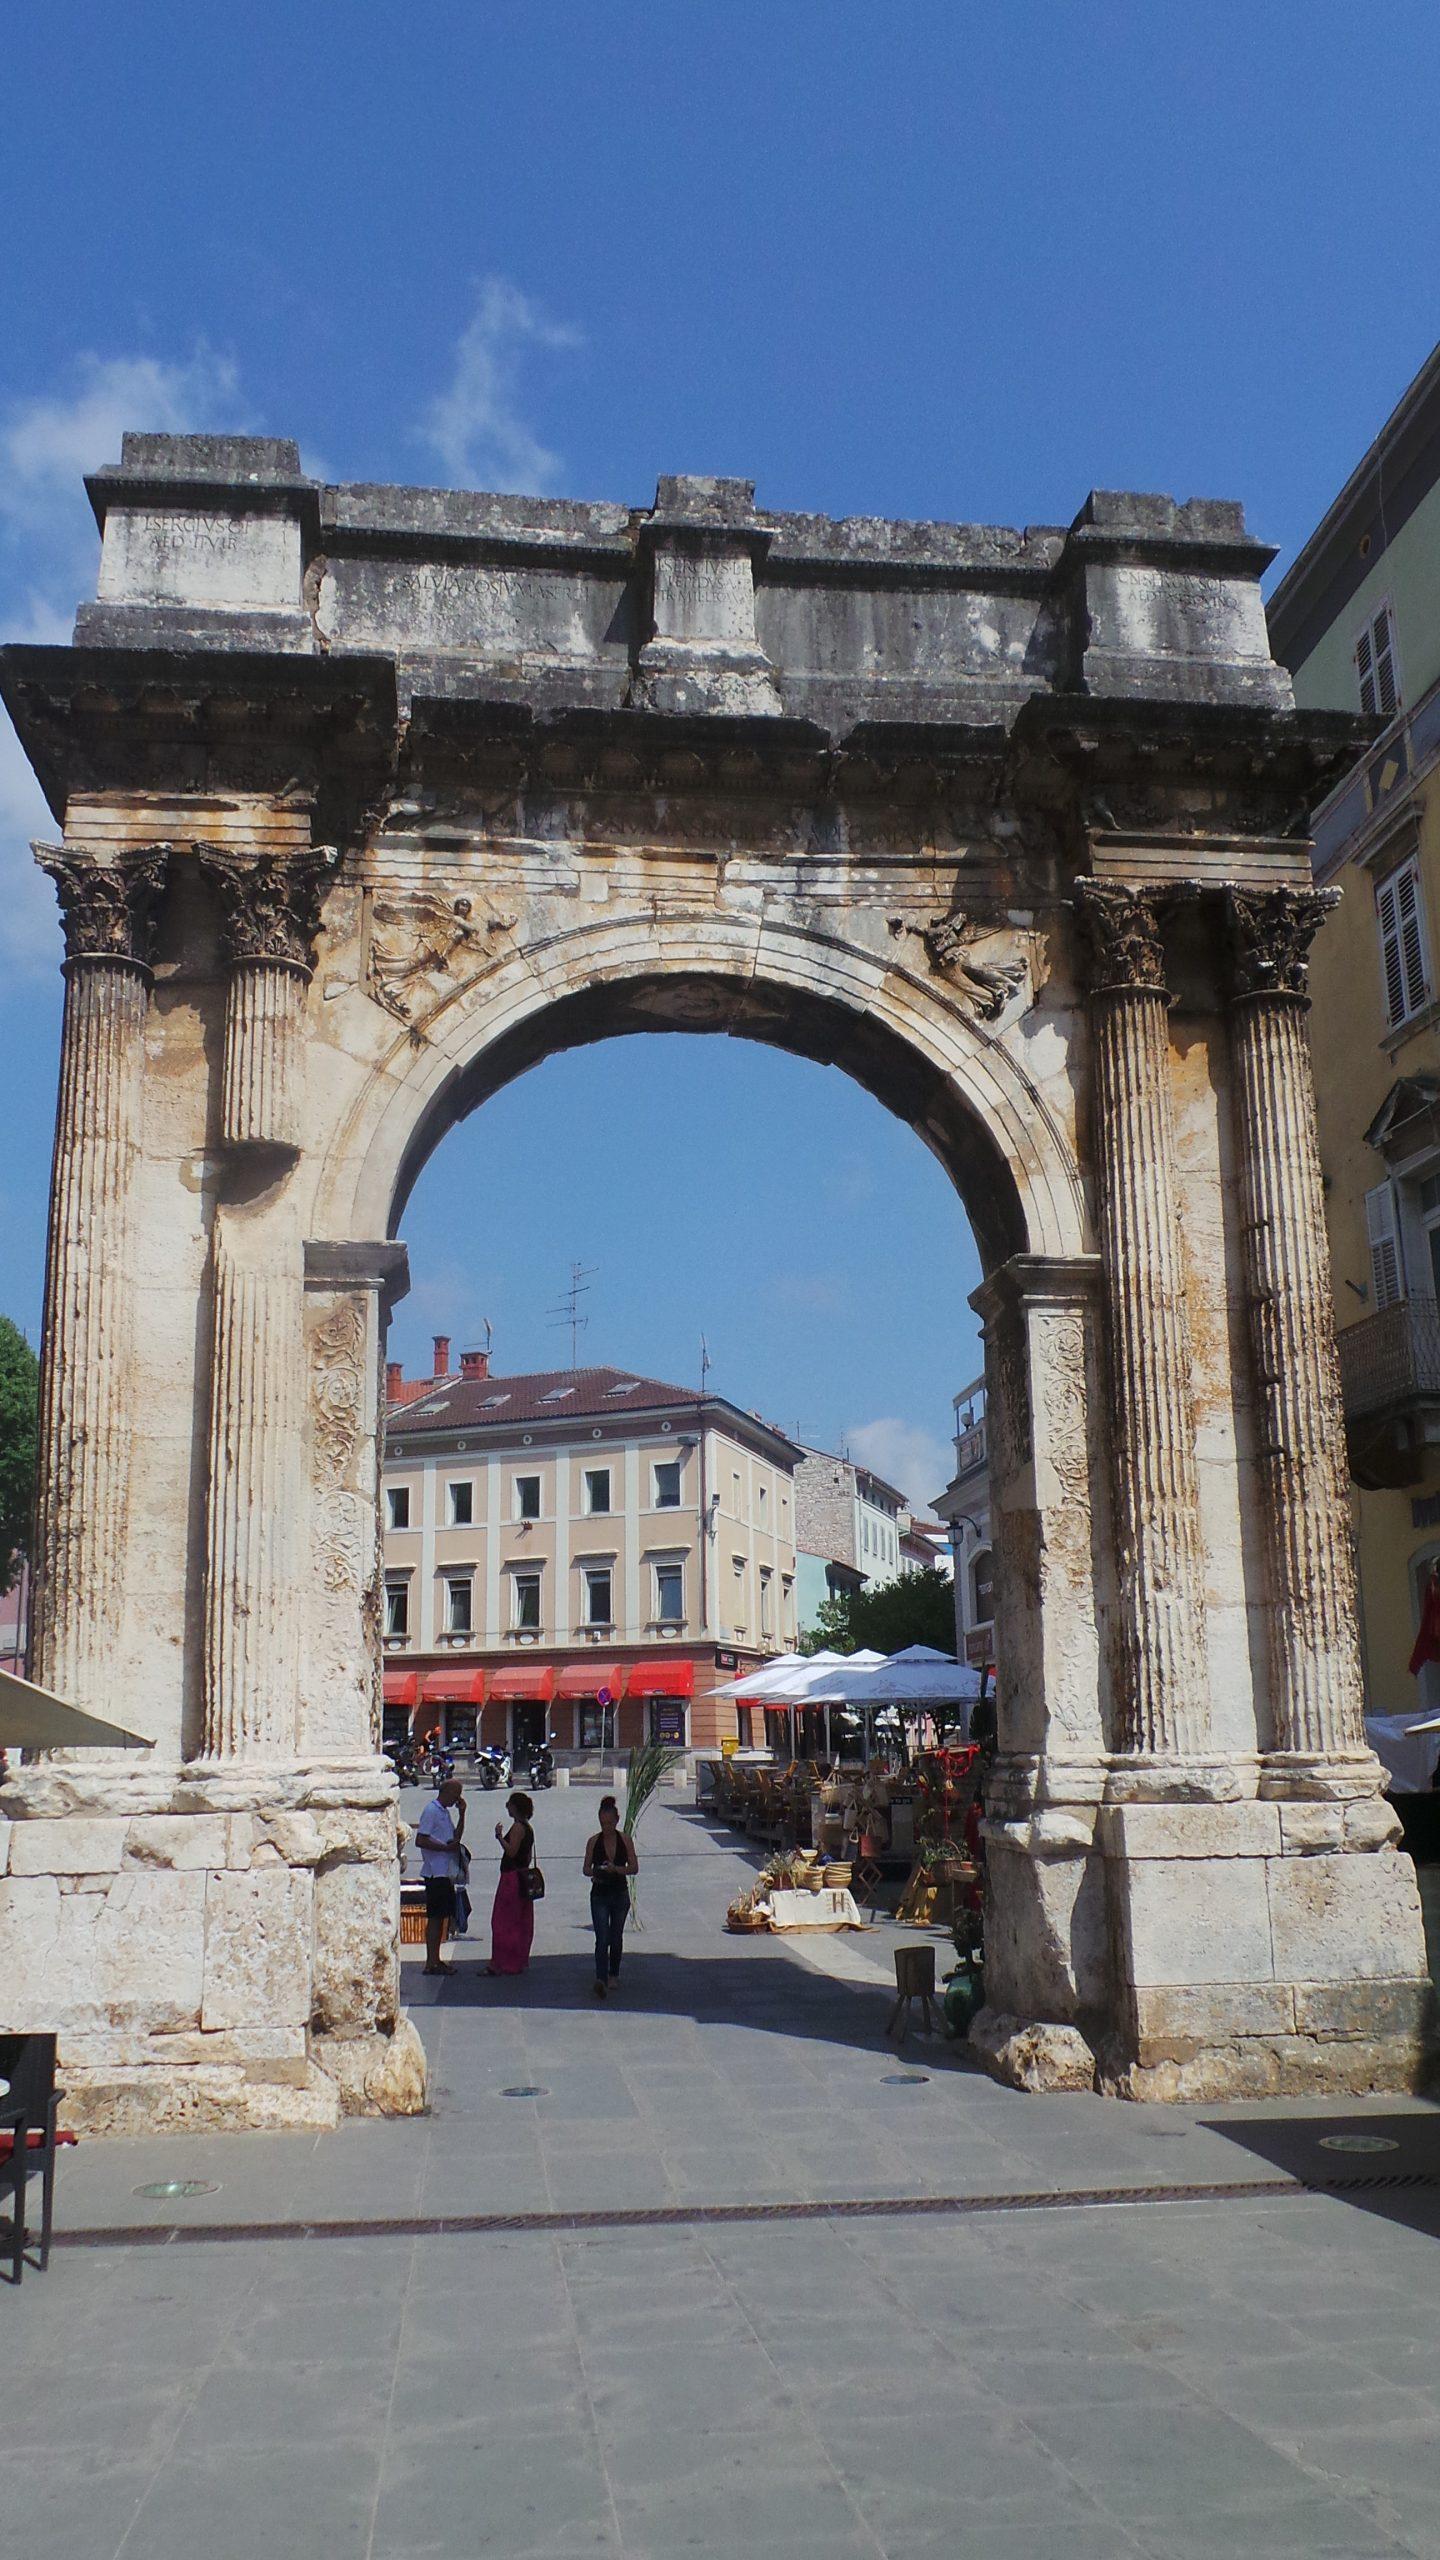 Triumphal Arch of Sergius, Pula, Croatia